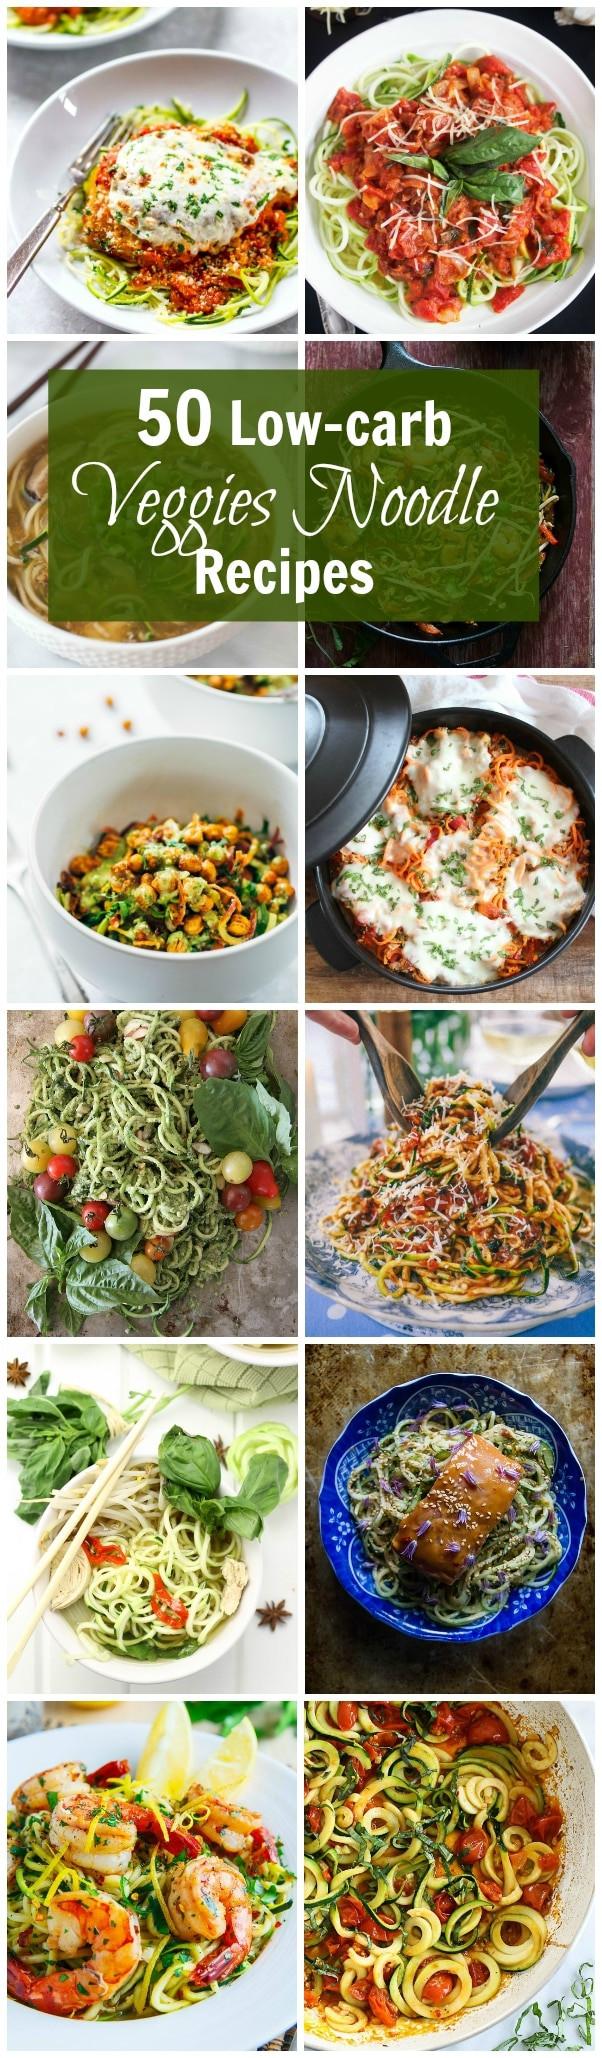 Low Carb Vegetables Recipes  50 Low Carb Veggies Noodle Recipes Primavera Kitchen